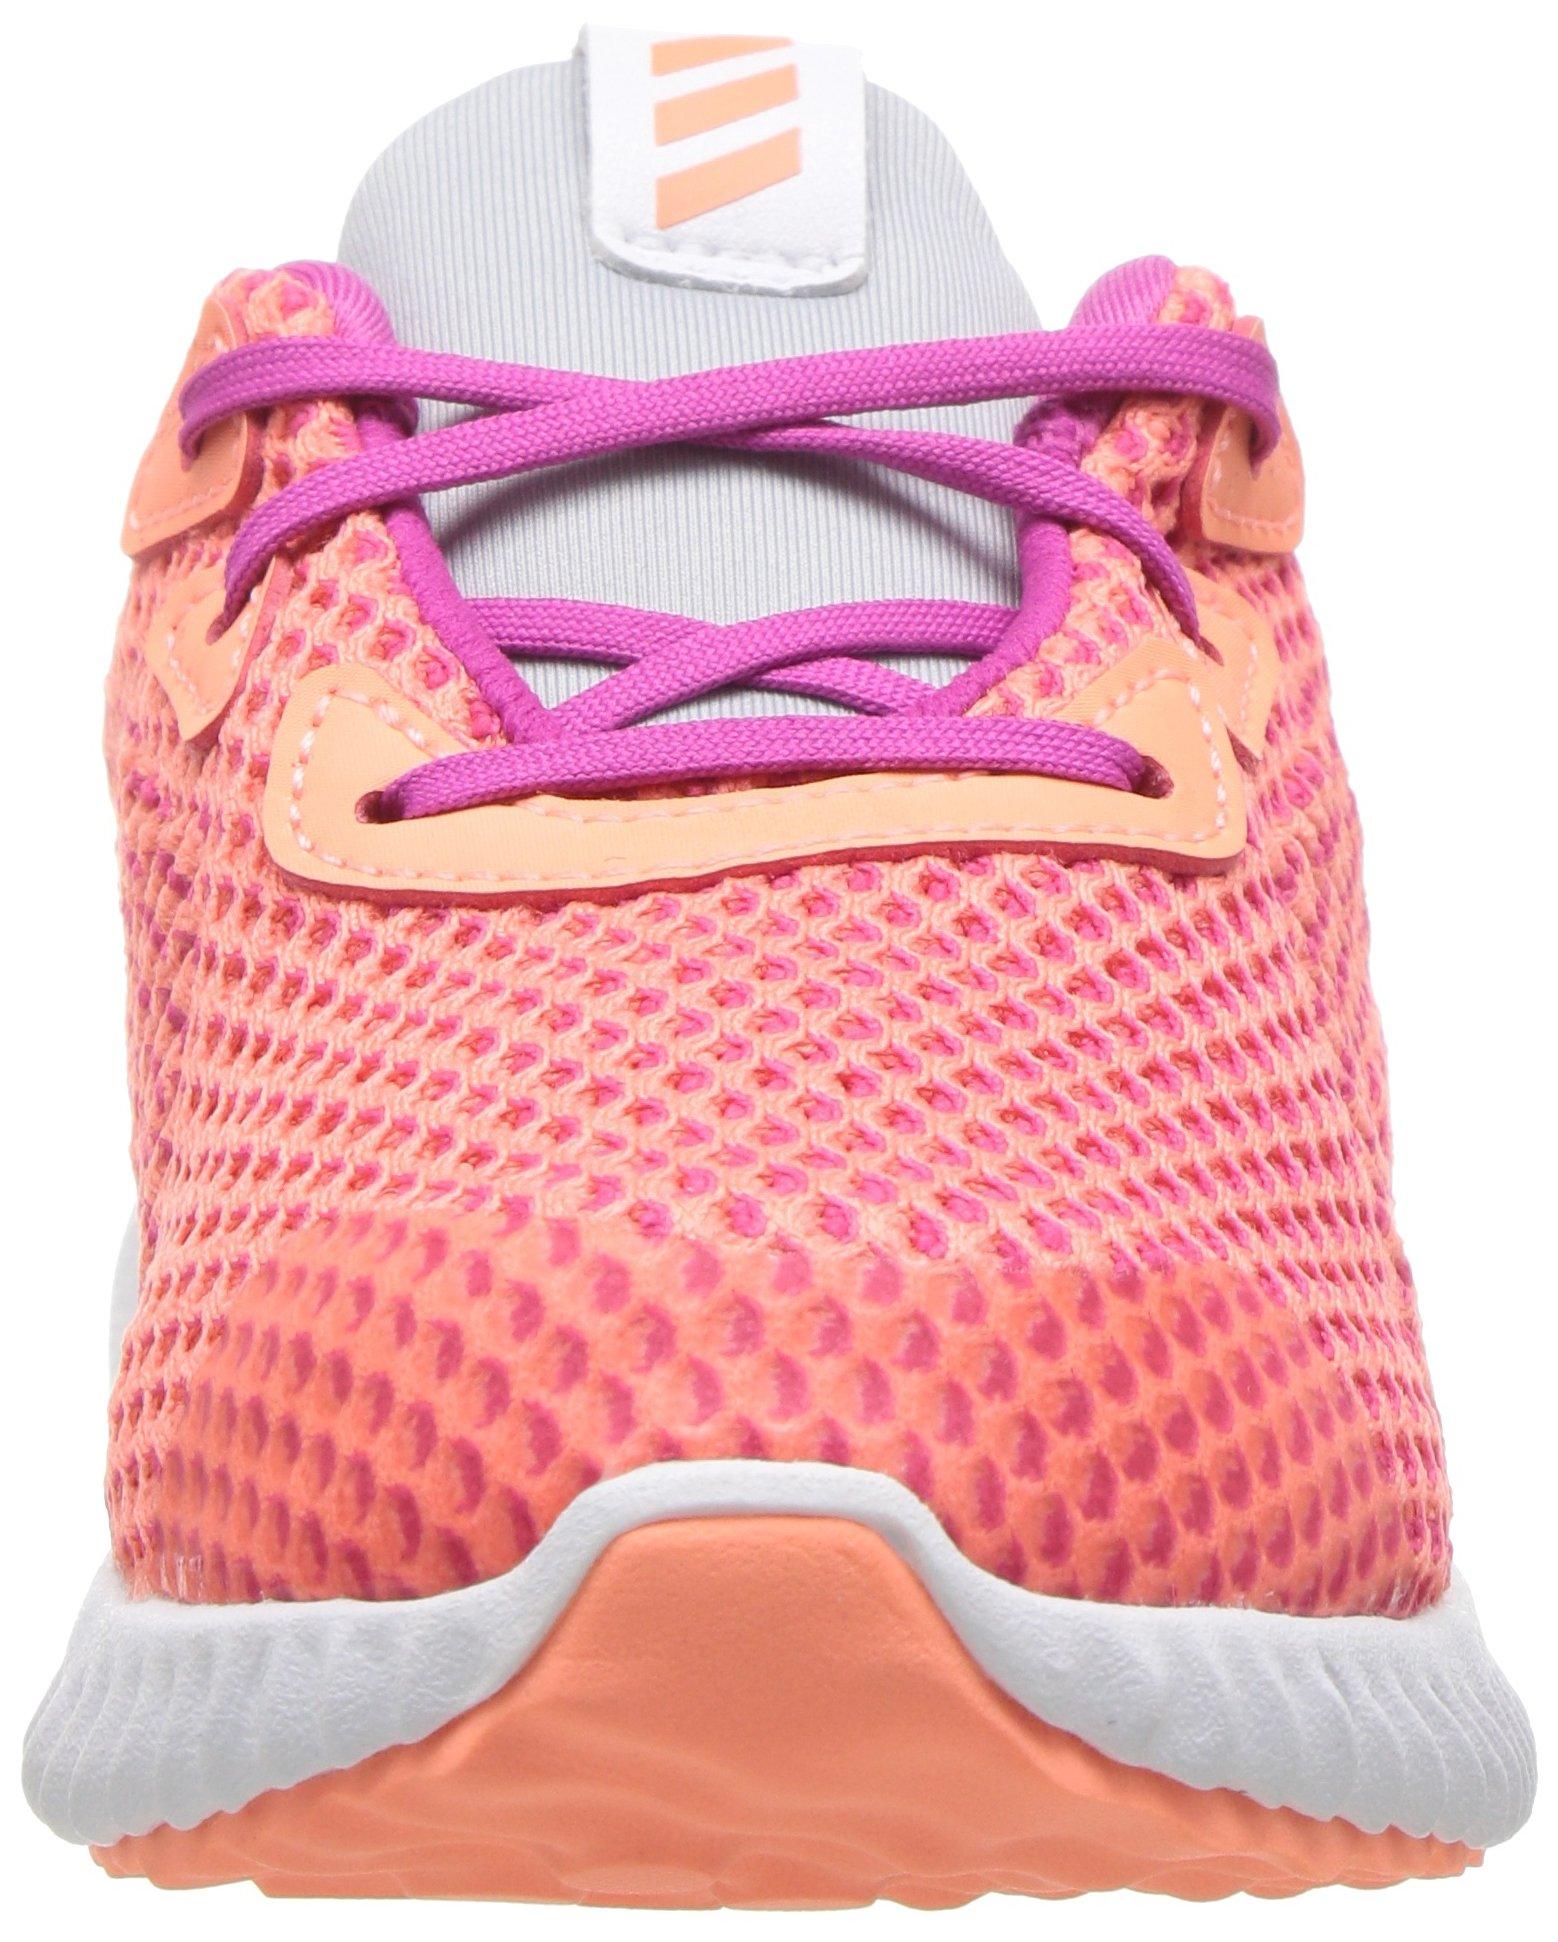 adidas Kids' Alphabounce Running Shoe, Bahia Magenta/Sun Glow/Clear Grey, 4 Medium US Toddler by adidas (Image #4)